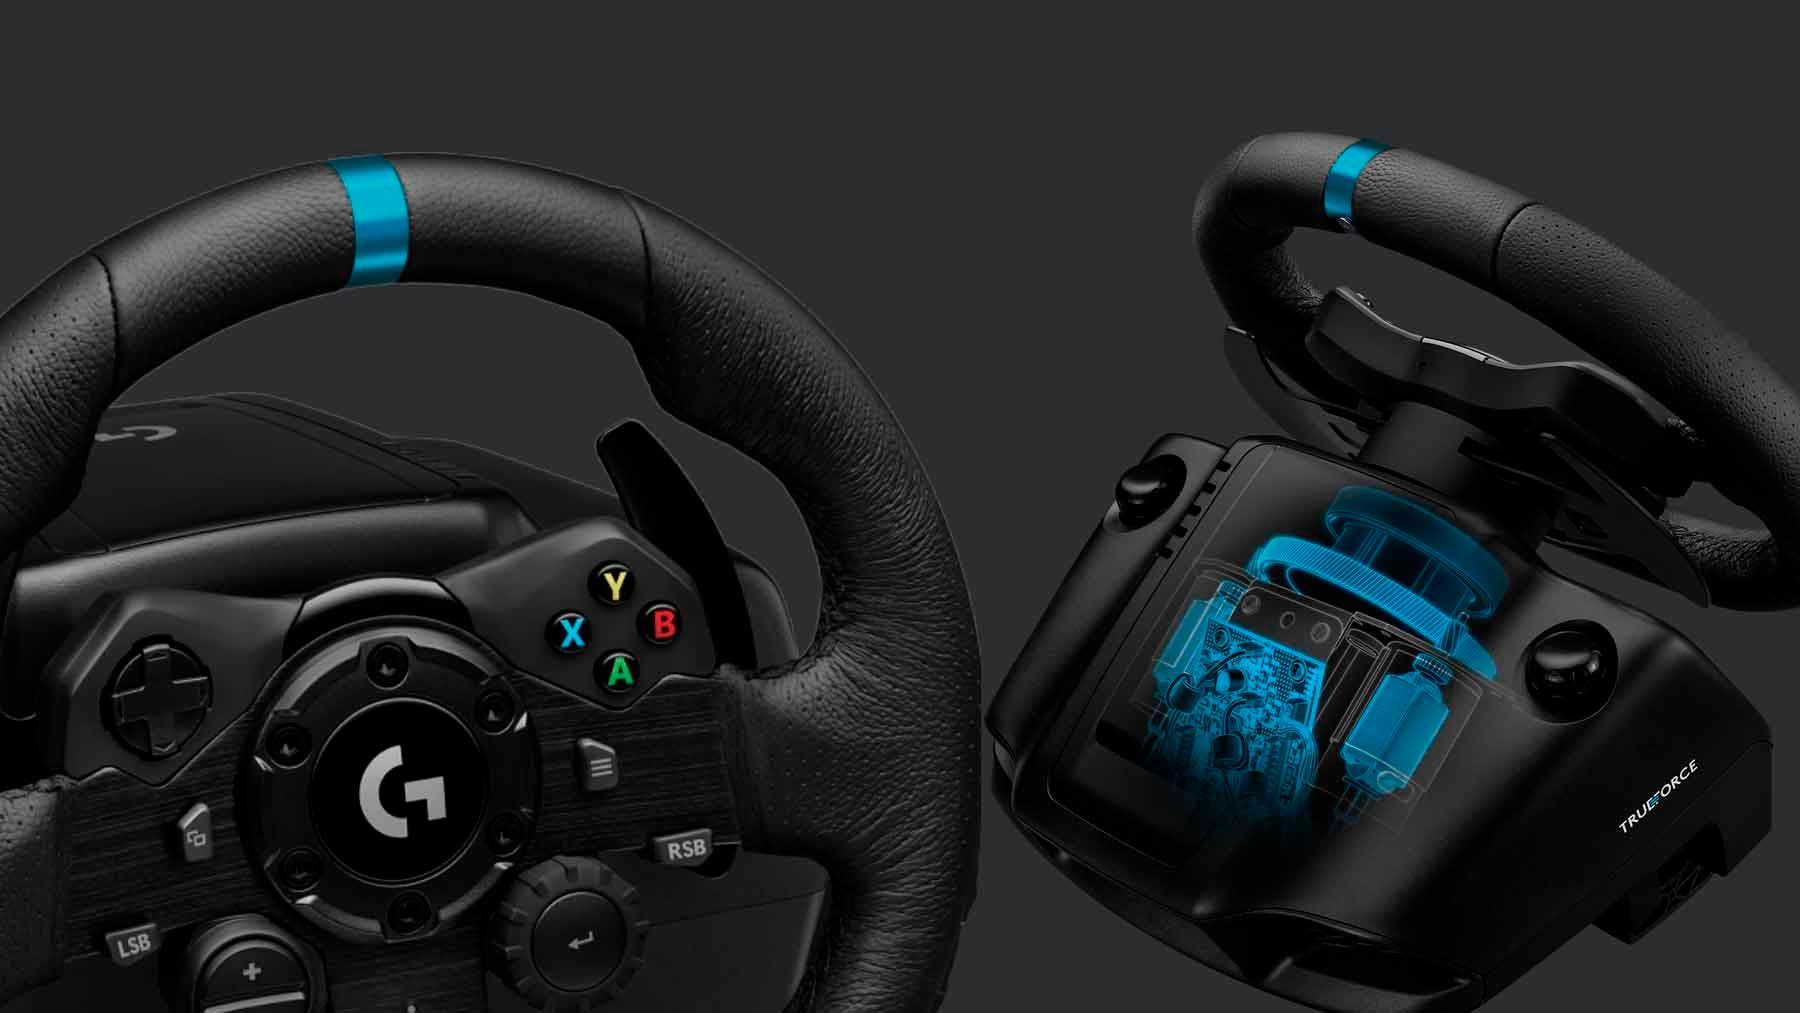 Análisis del Logitech G923 para Xbox One y PC 5